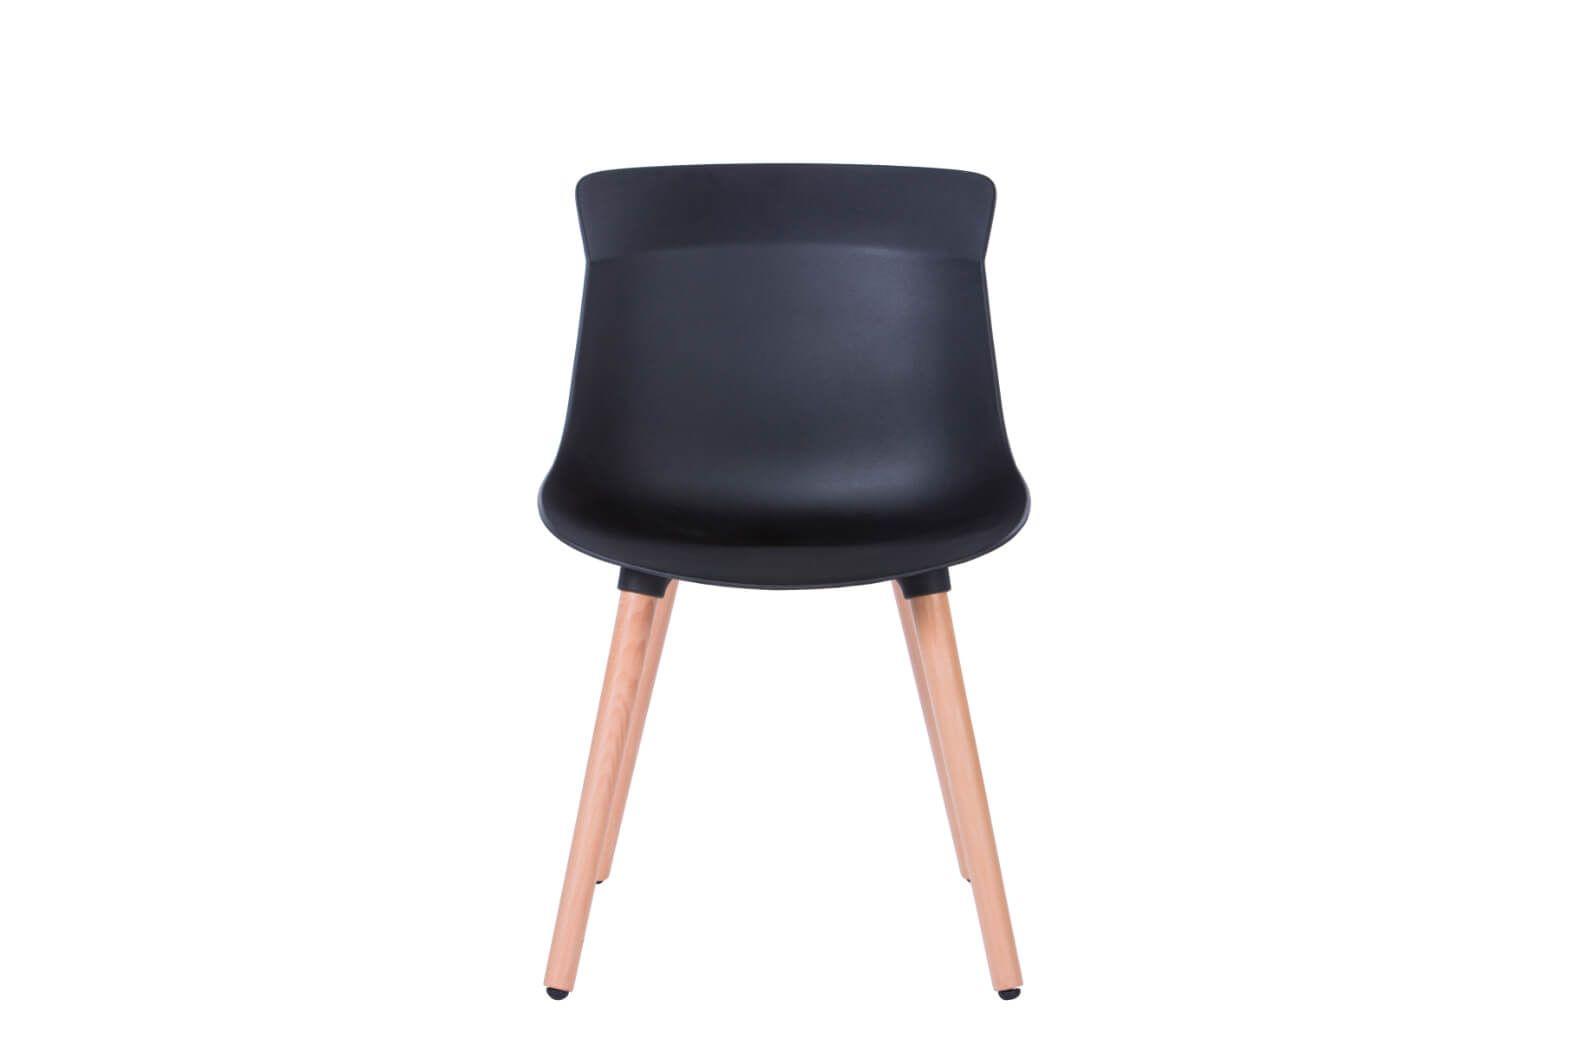 Greta negra con patas de madera